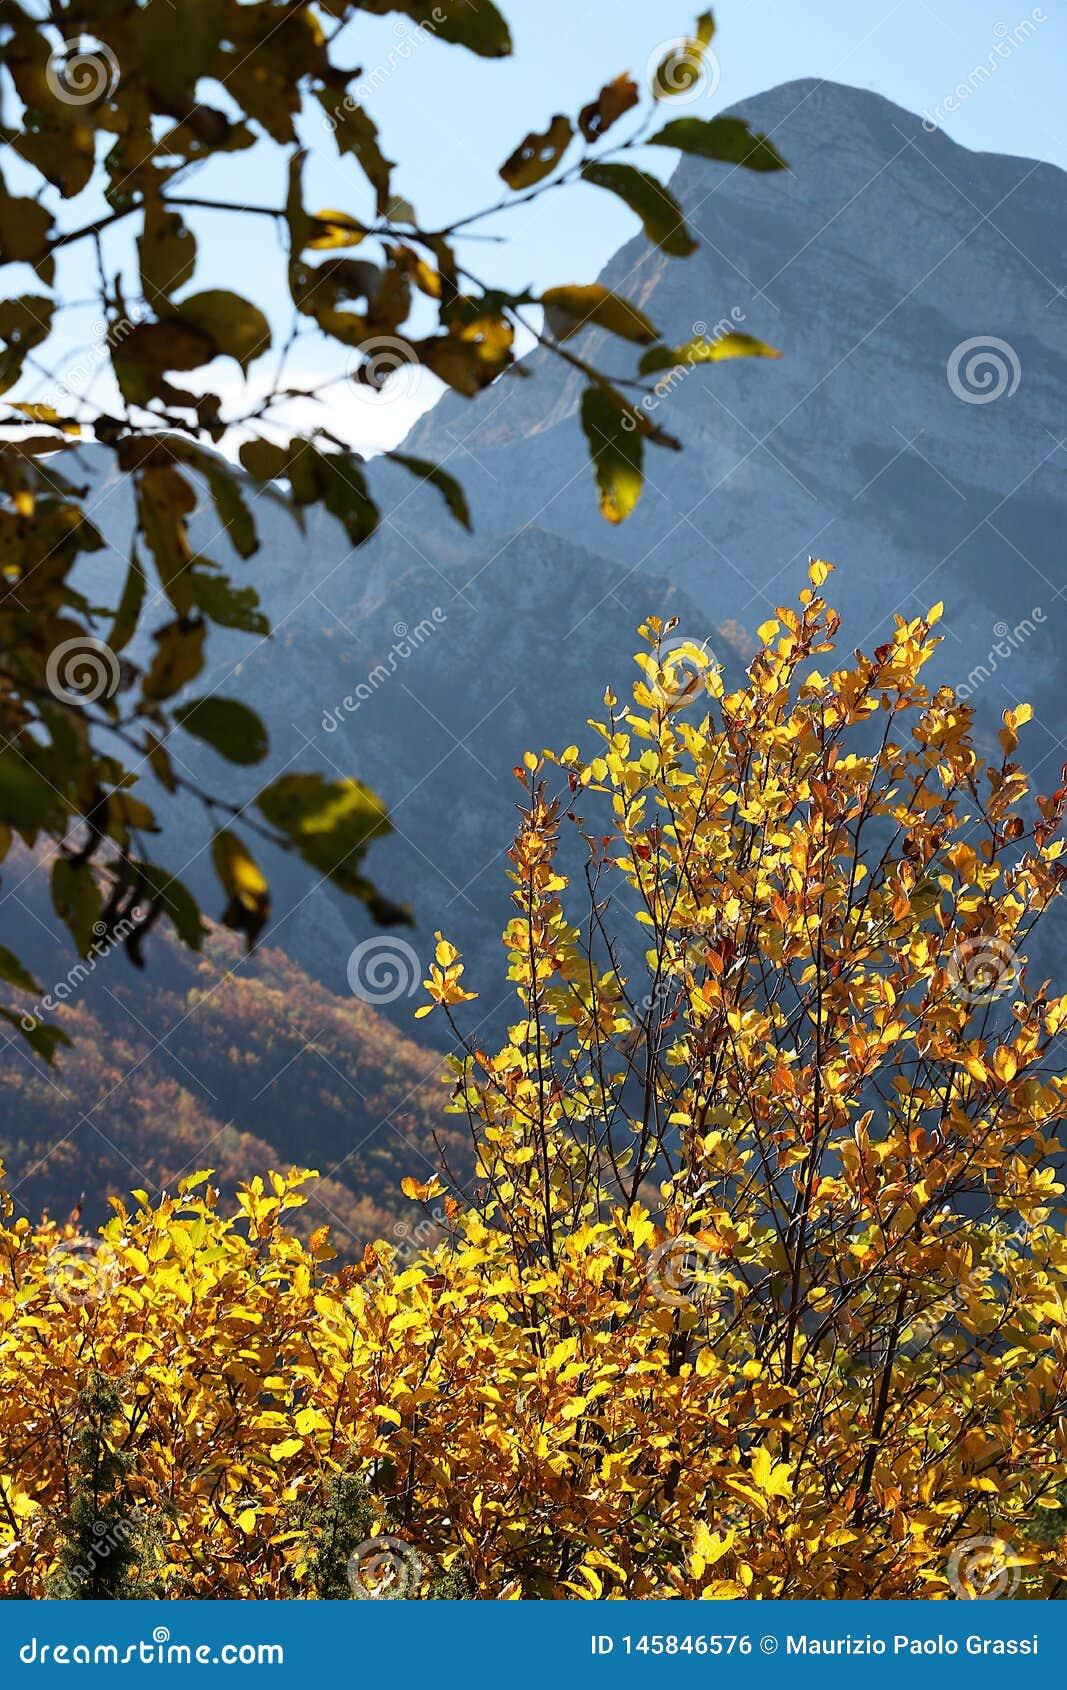 Alpi Apuane, Massa Carrara, Tuscany, Italy. Beech leaves in autu